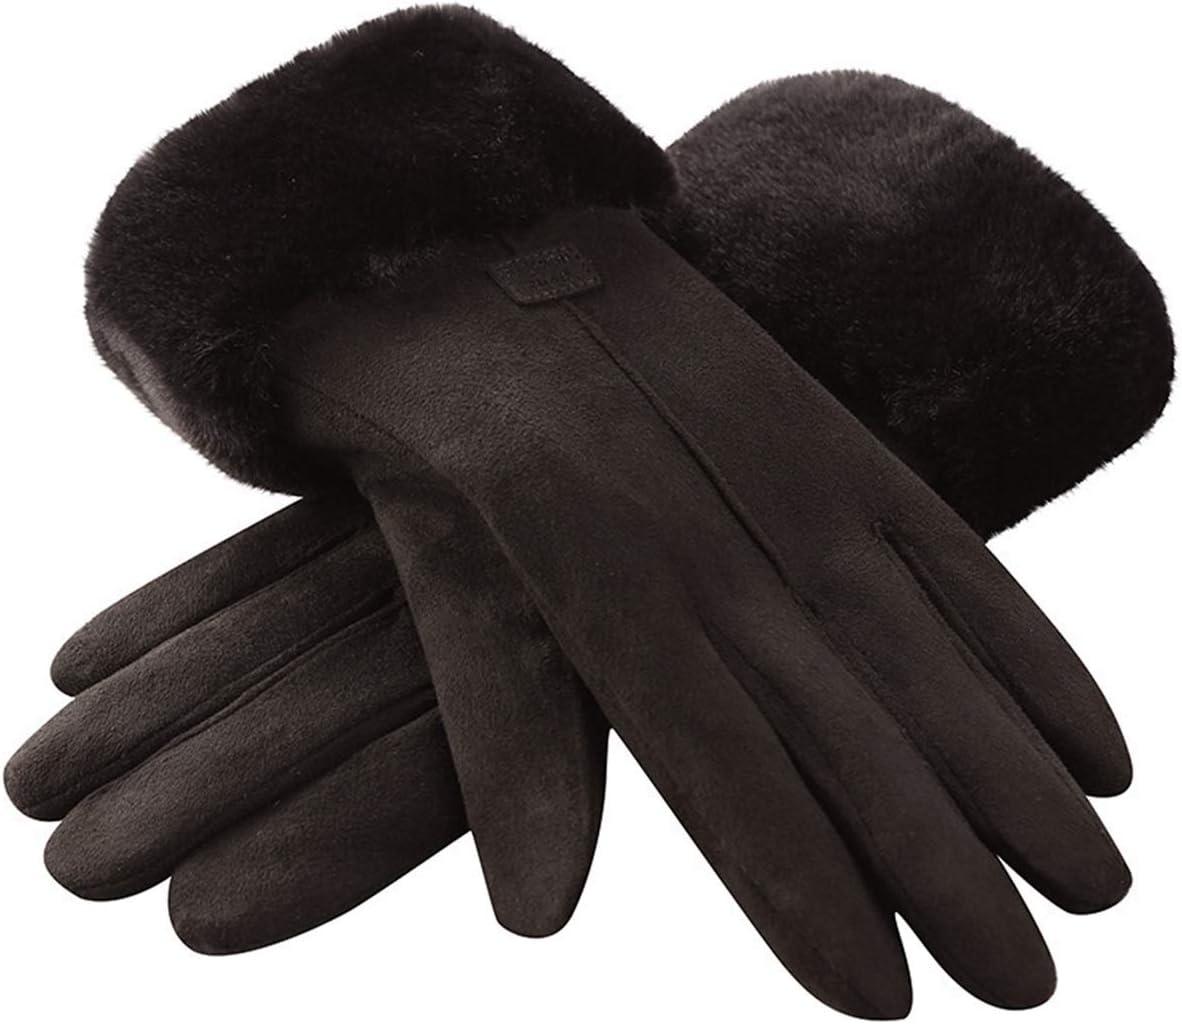 PENGYMY Winter Gloves Women Winter Plush Warm Gloves Ladies Girls Outdoor Sport Heat Full Finger Lined Driving Glove (Color : Black)